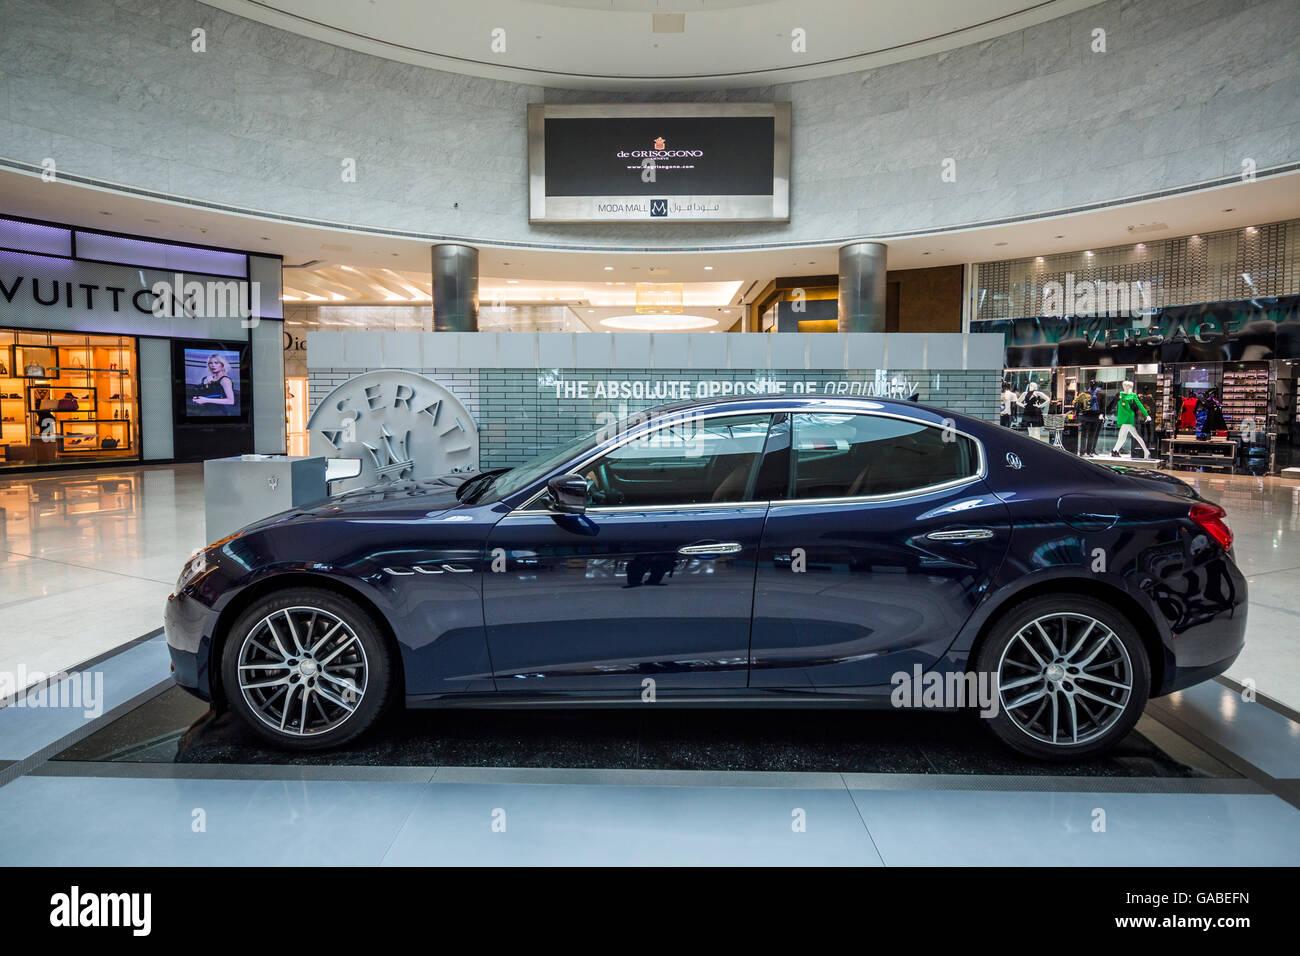 Maserati Ghibli, MODA Mall, Bahrain World Trade Center, Manama, Bahrain. - Stock Image